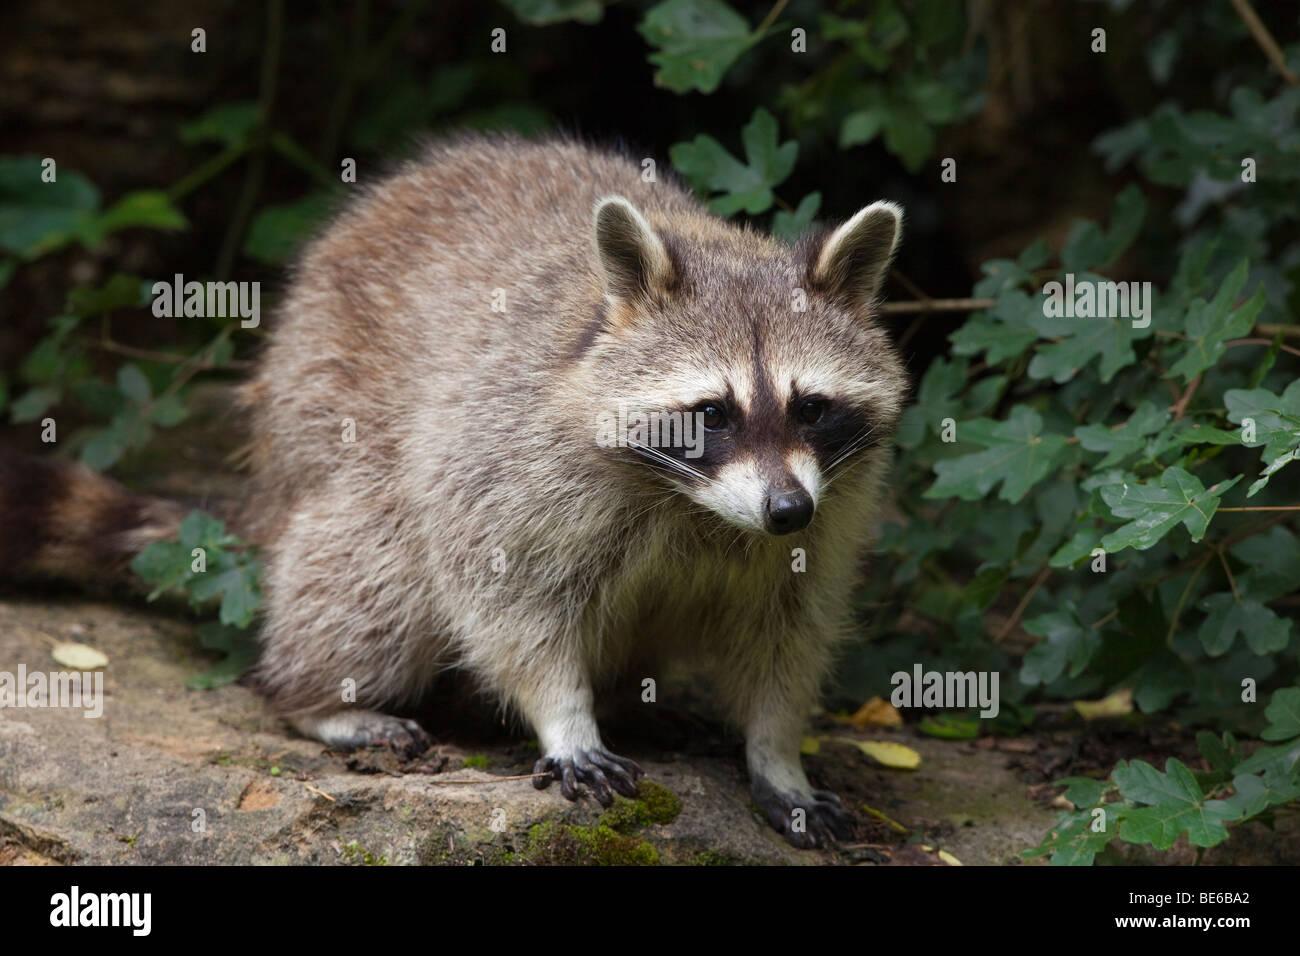 Raccoon (Procione lotor), in piedi. Immagini Stock